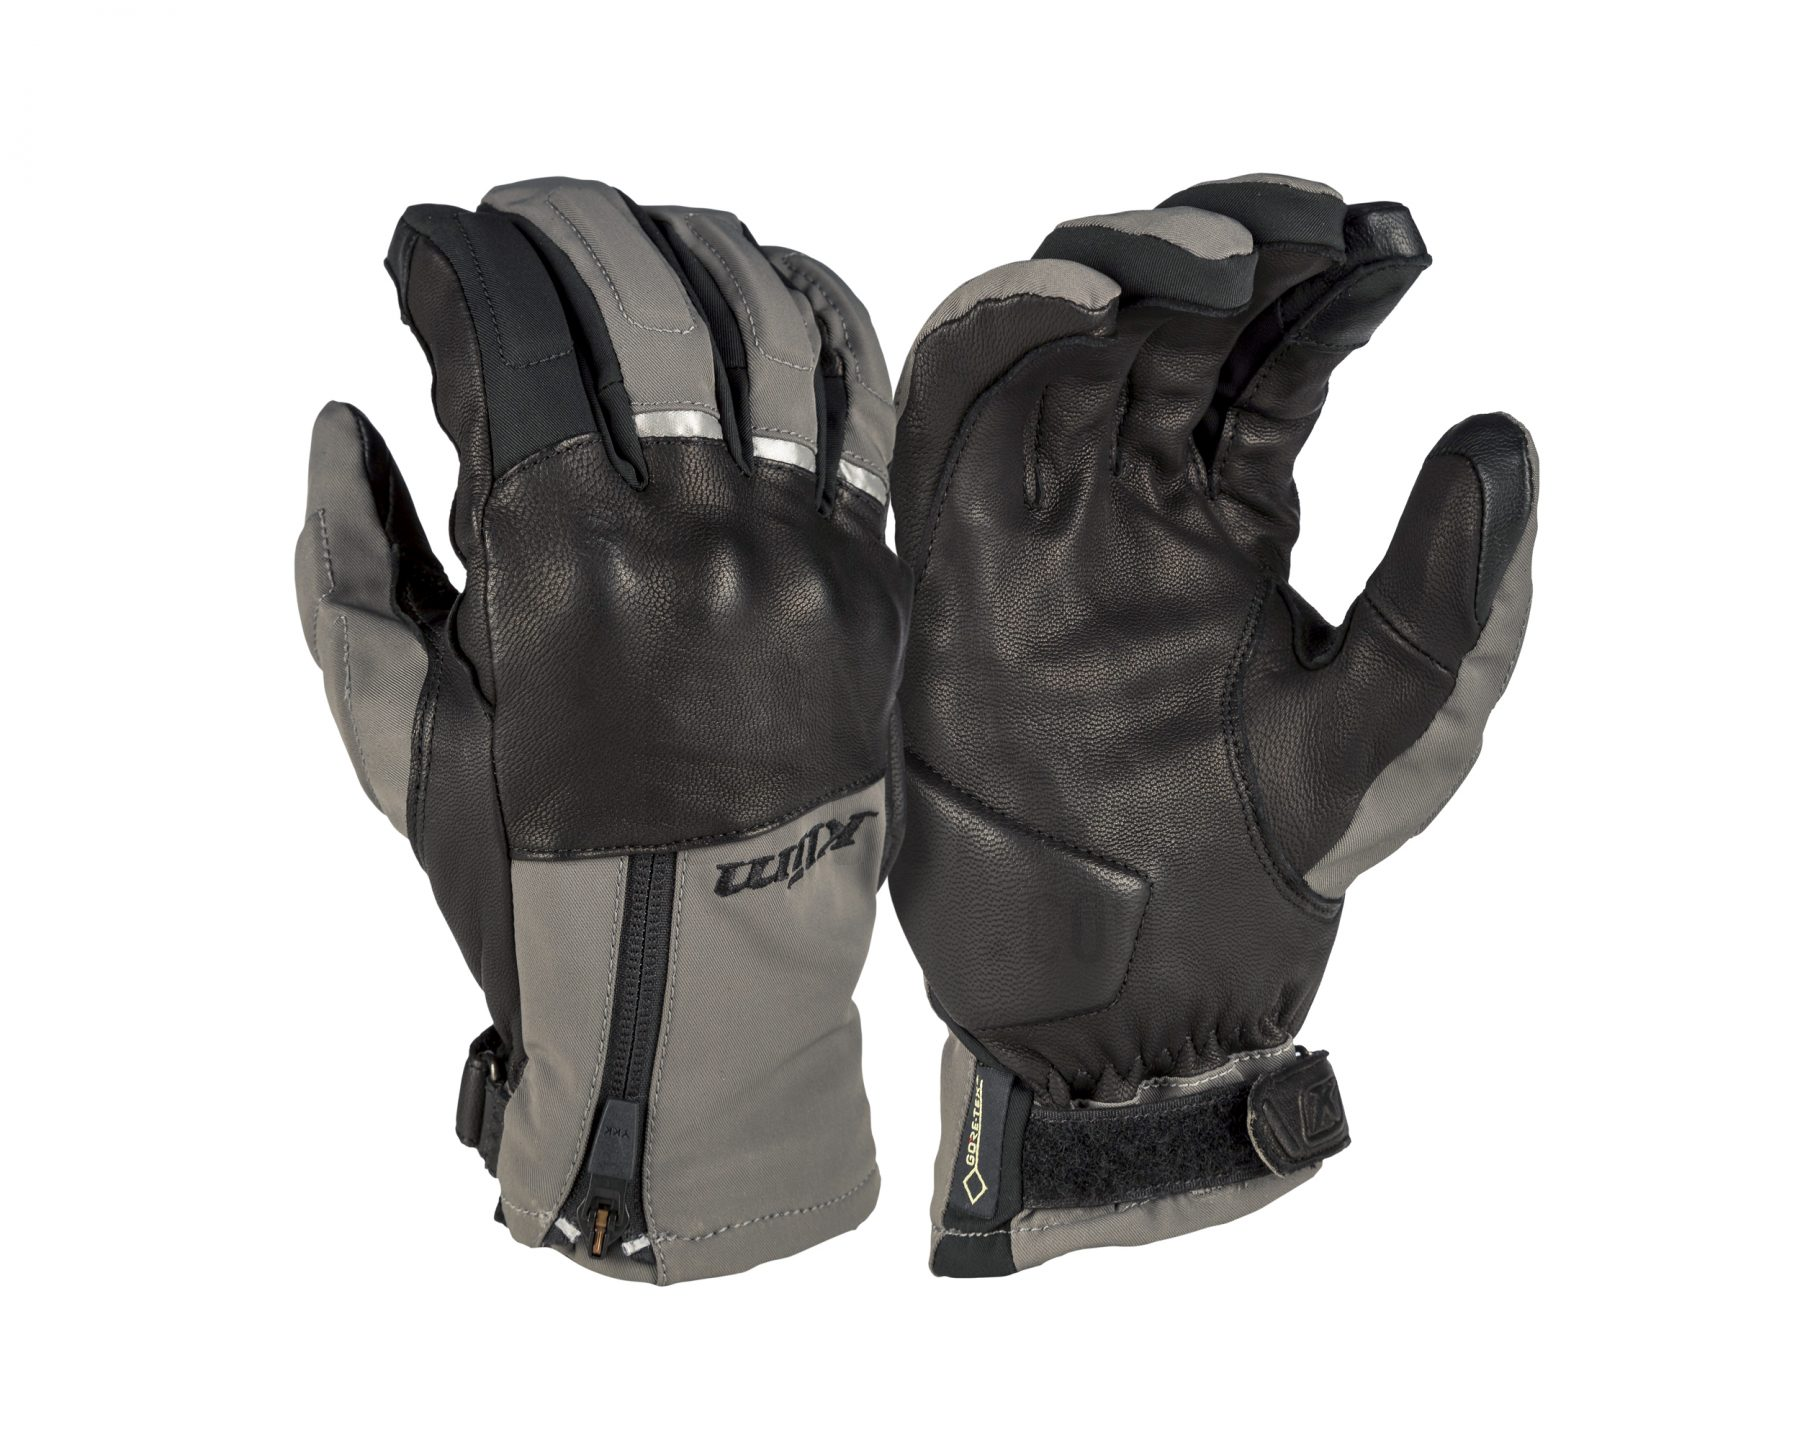 Vanguard GTX Short Glove_3922-000_Gray_Secondary_02